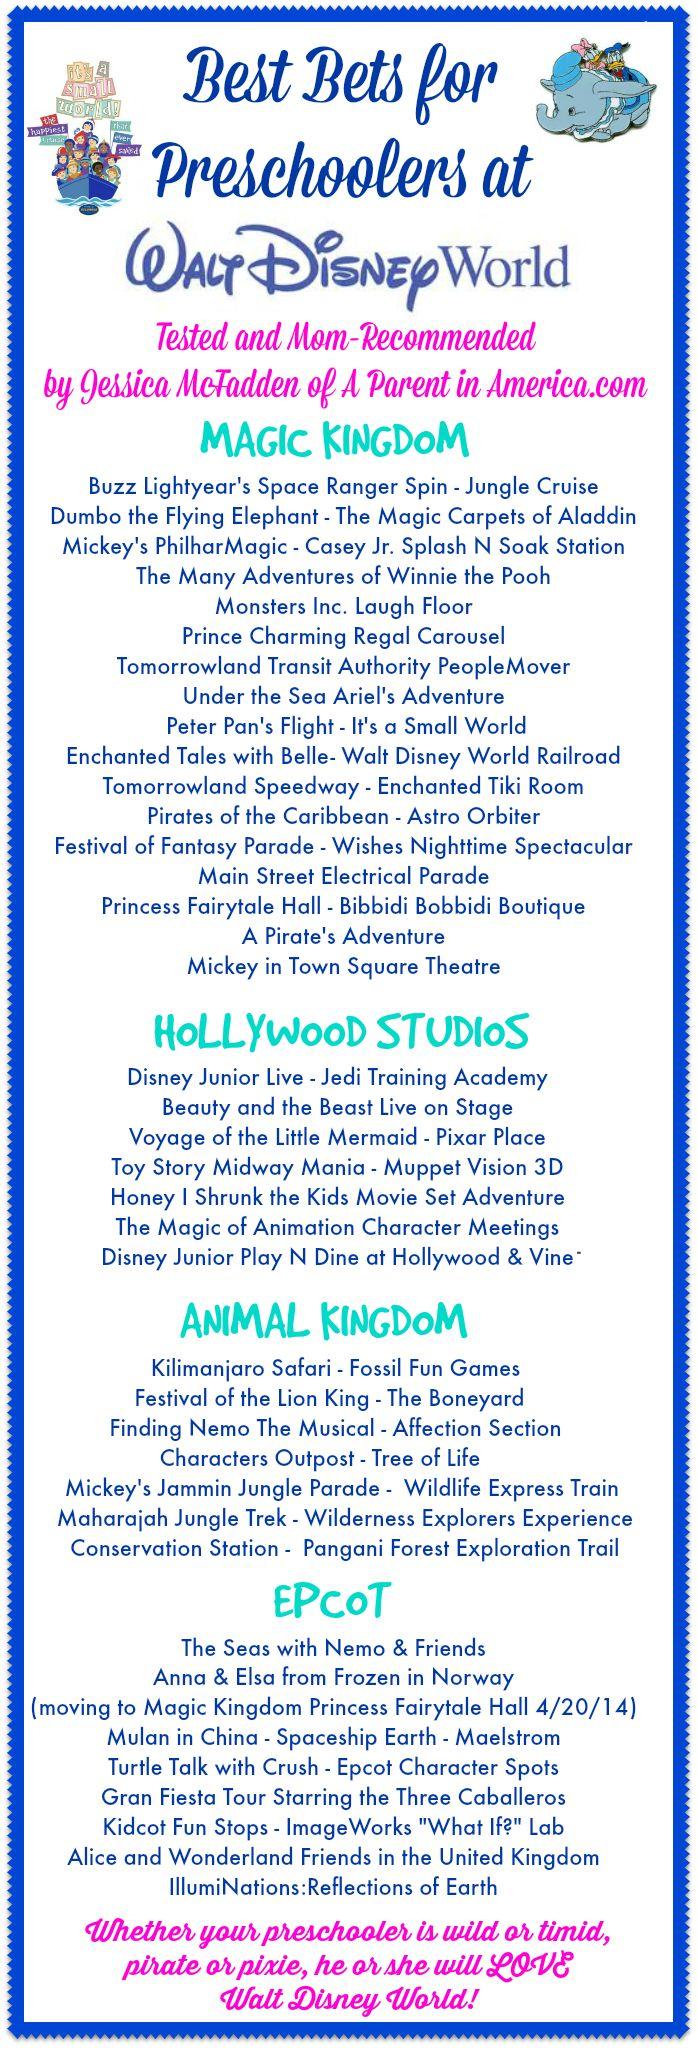 Great list of preschool friendly attractions at Walt Disney World